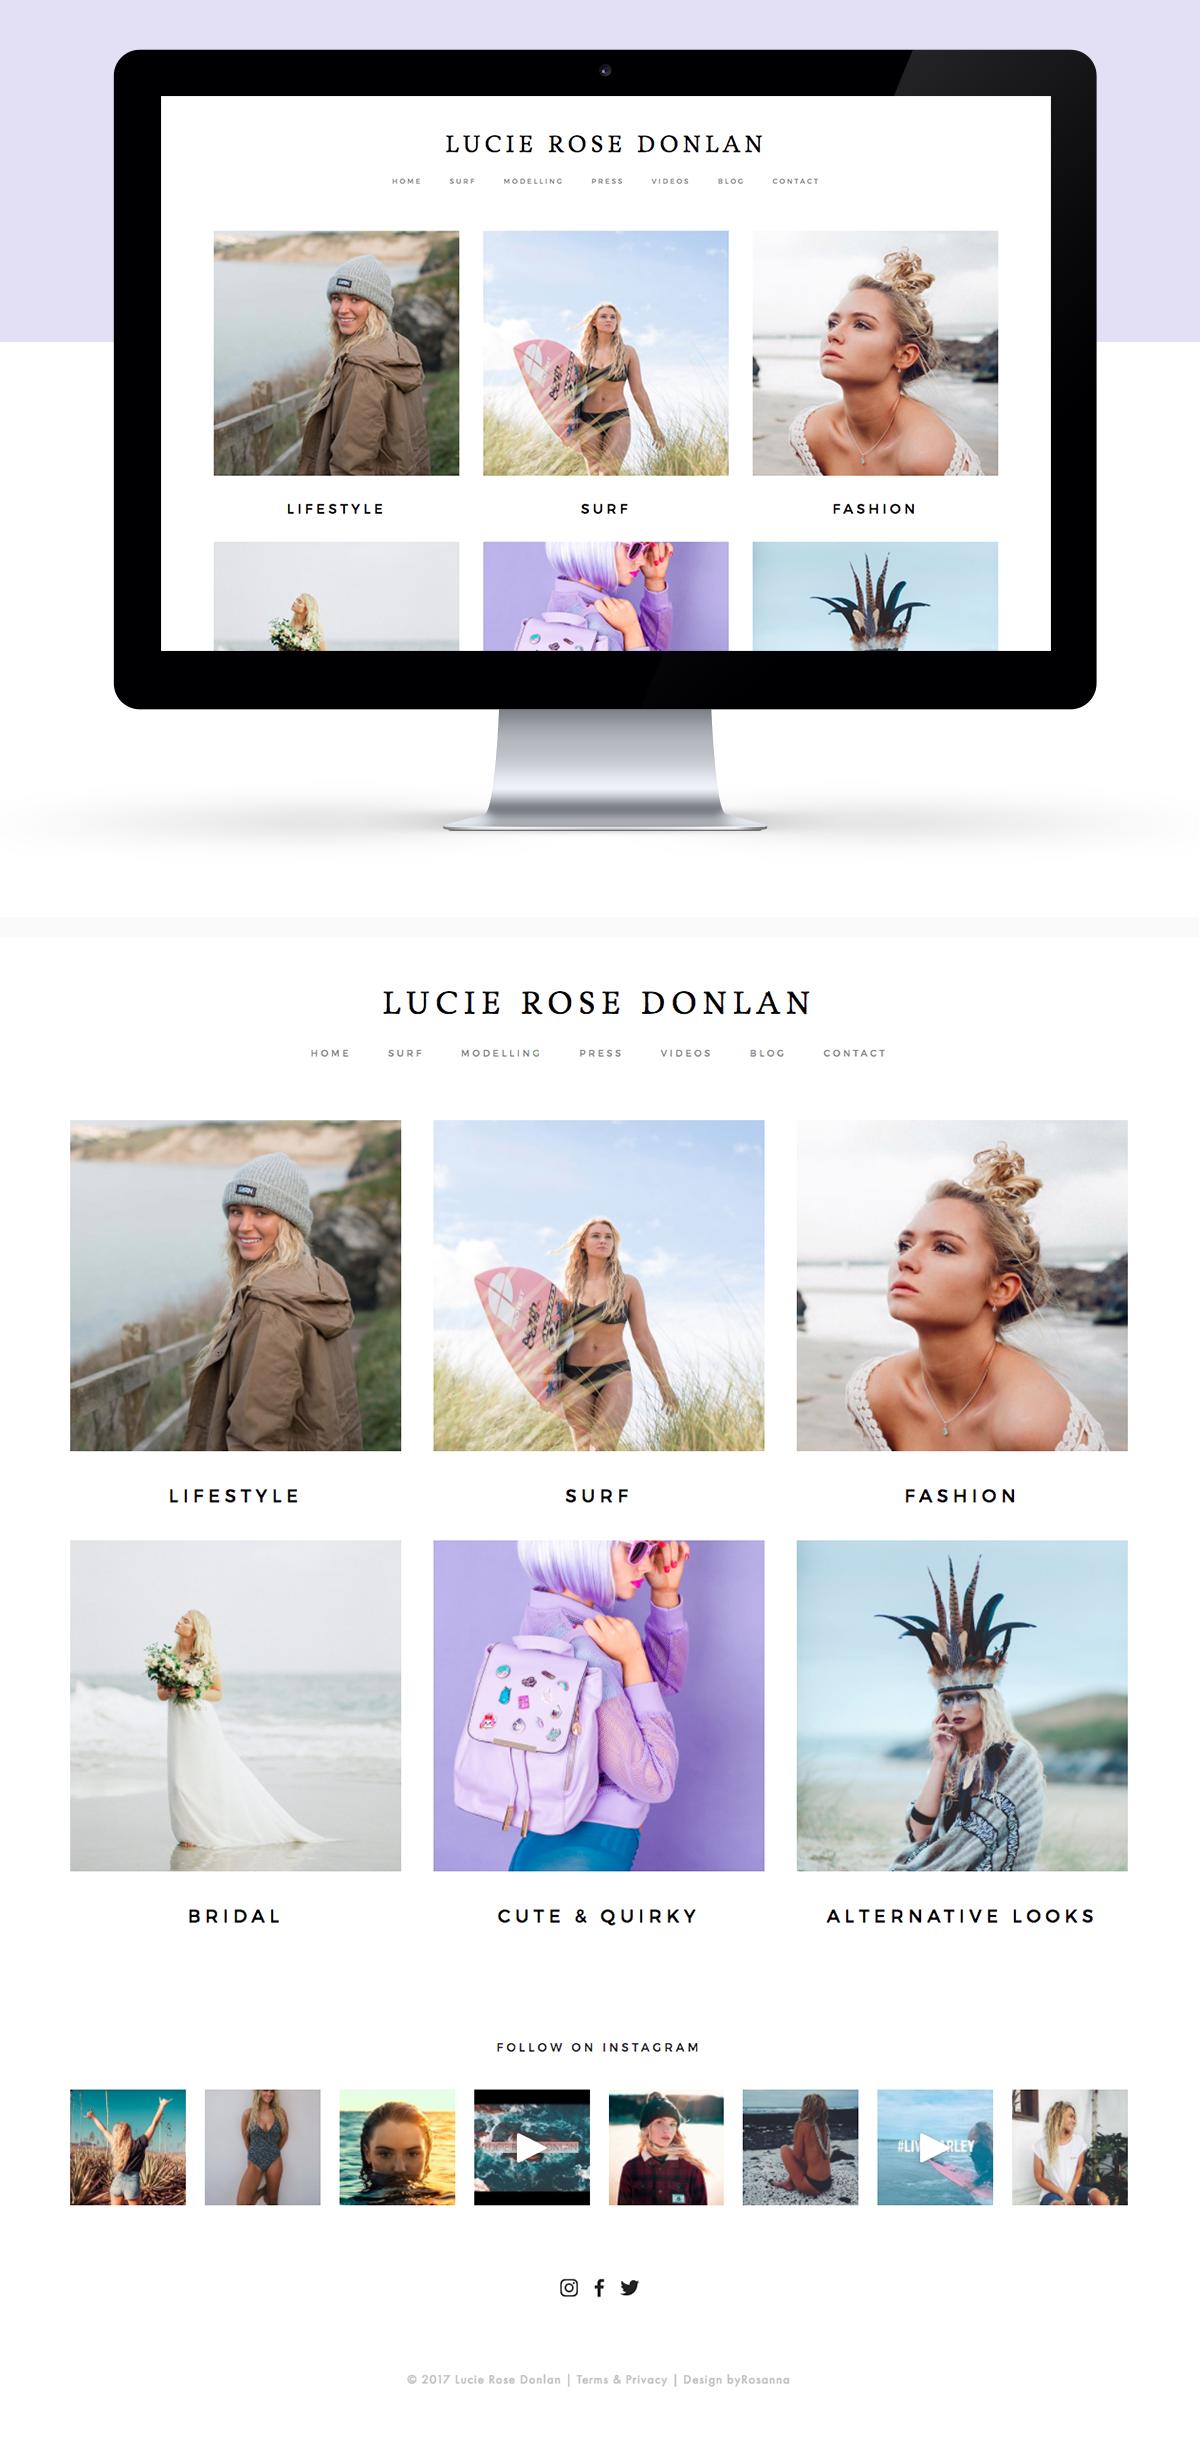 Lucie Rose Donlan website design